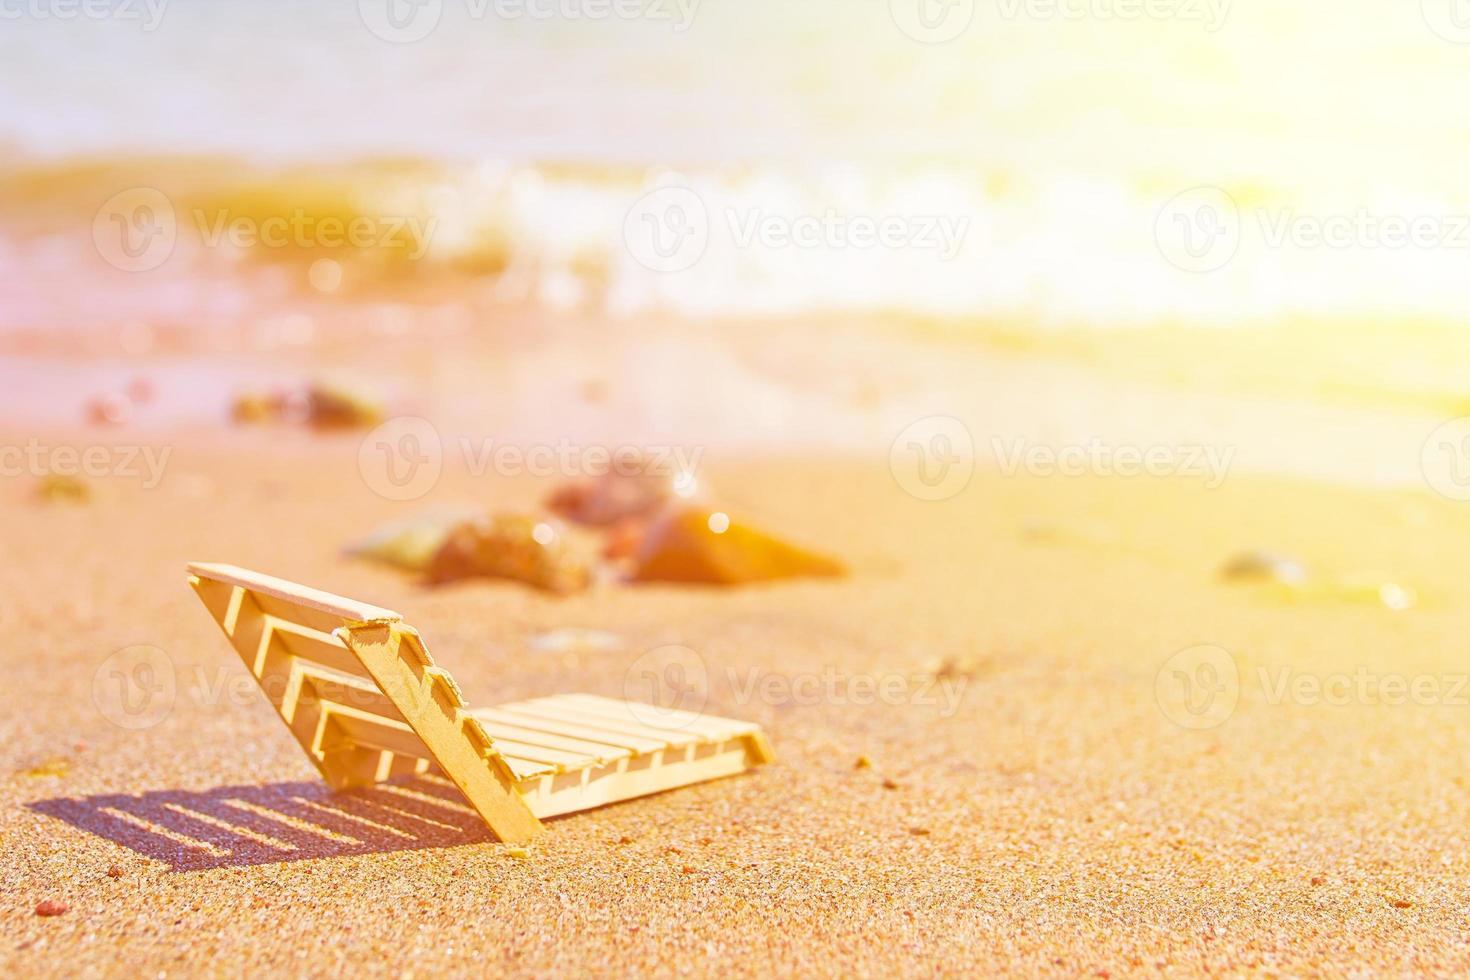 Wooden deckchair on a tropical sand beach photo